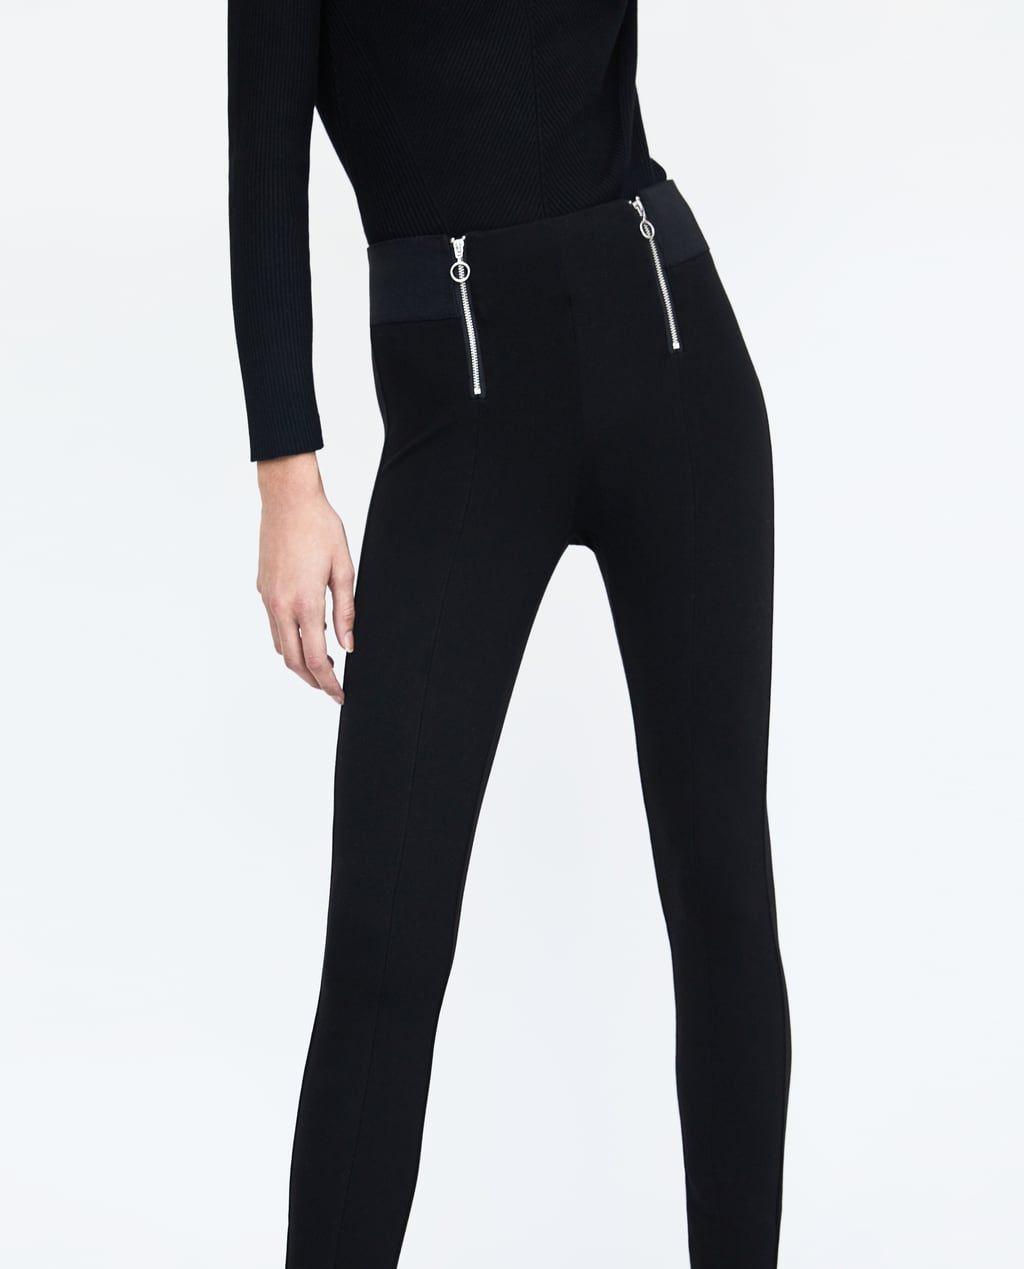 Zara Dan 2 Onu Fermuarli Tayt Resmi Womens Tights Leggings Zara